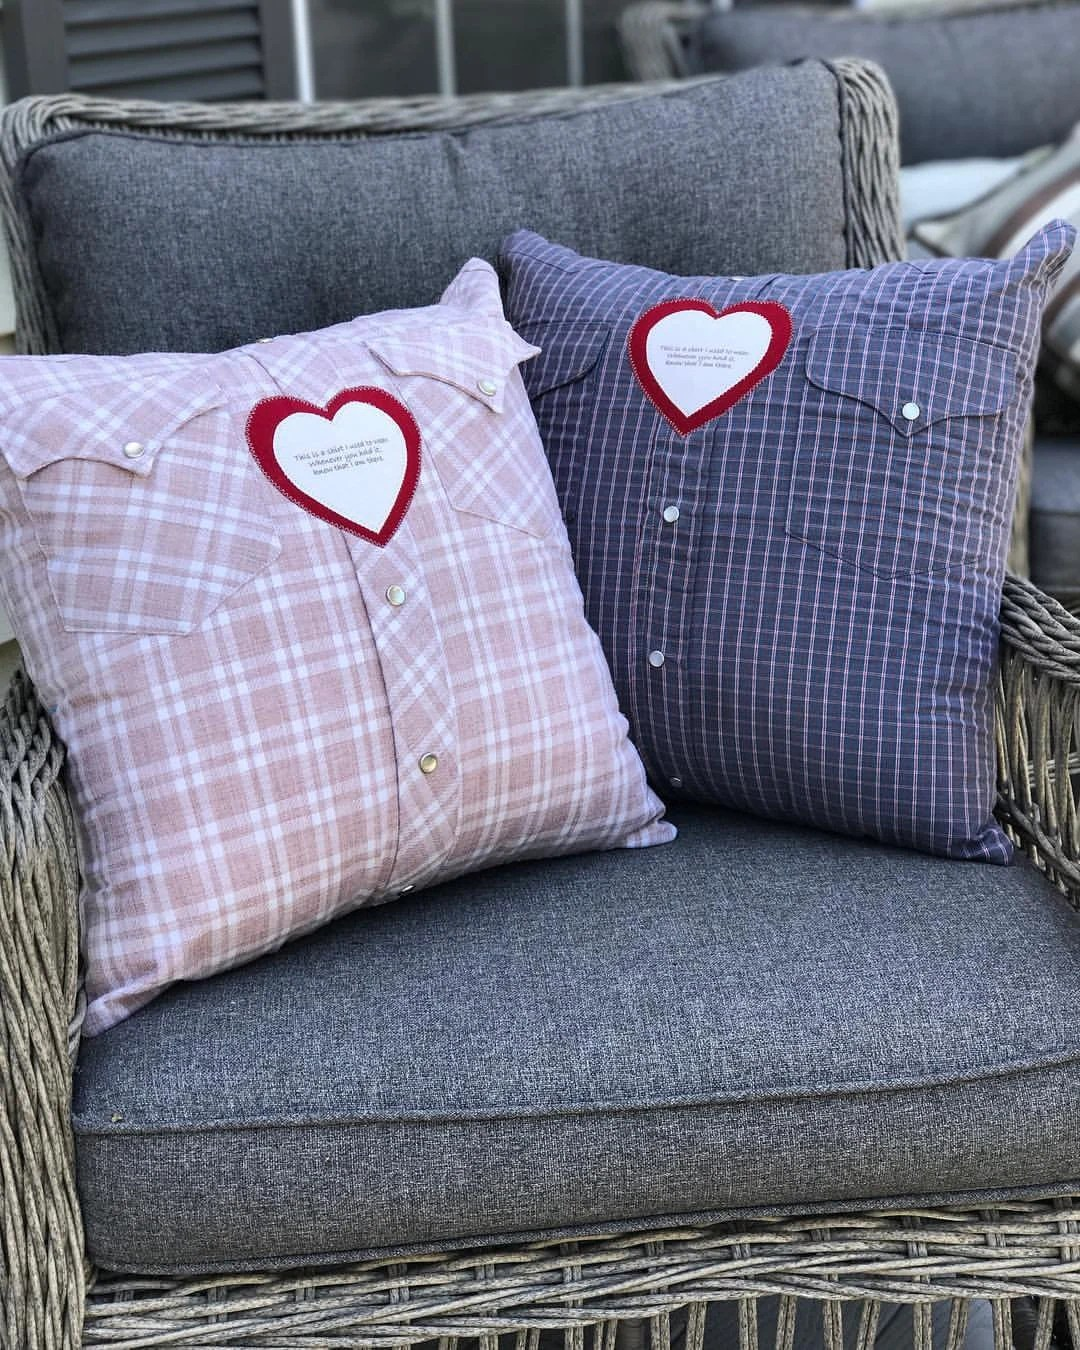 custom memory t shirt pillow with